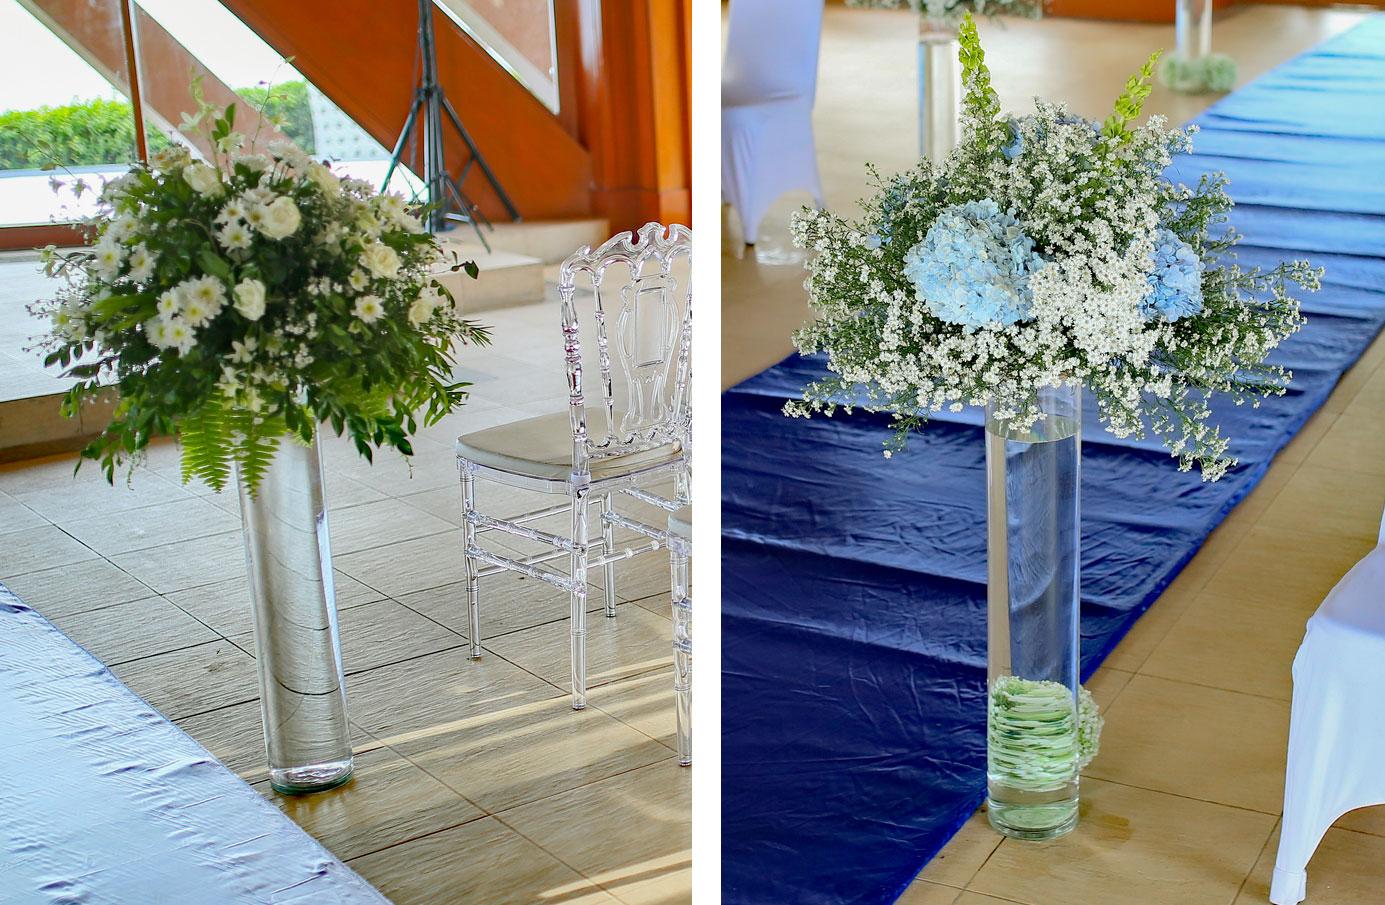 cebu-wedding-decoration (8)